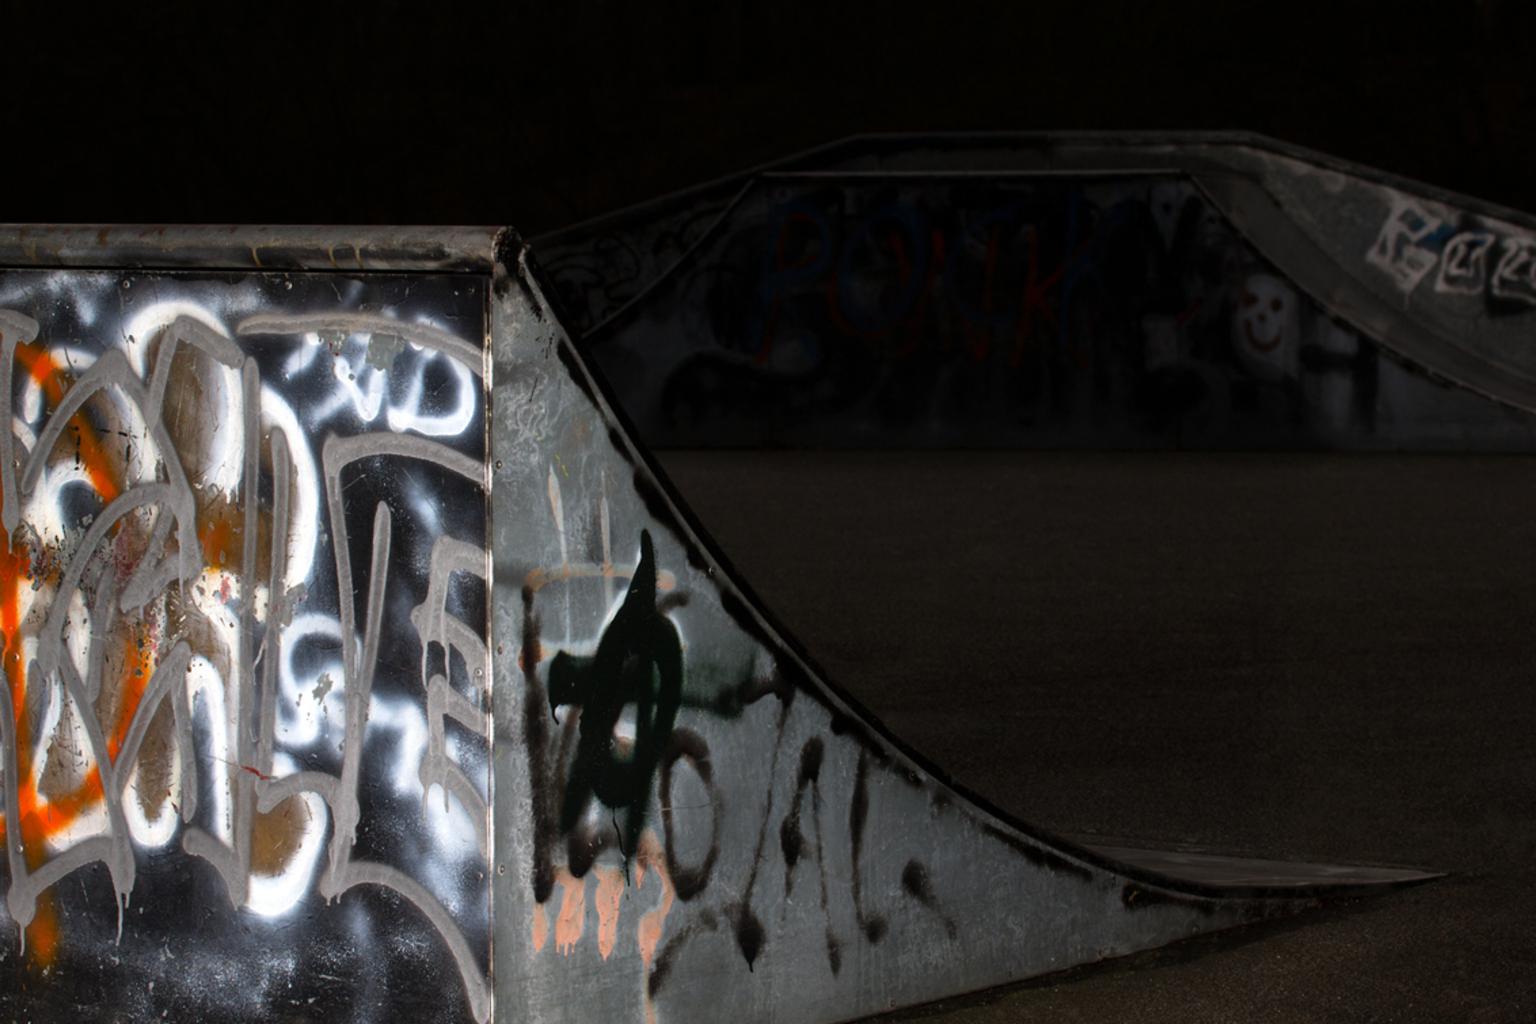 grafiti - Zomaar een foto van grafiti. - foto door ralphbrands op 15-01-2012 - deze foto bevat: grafiti